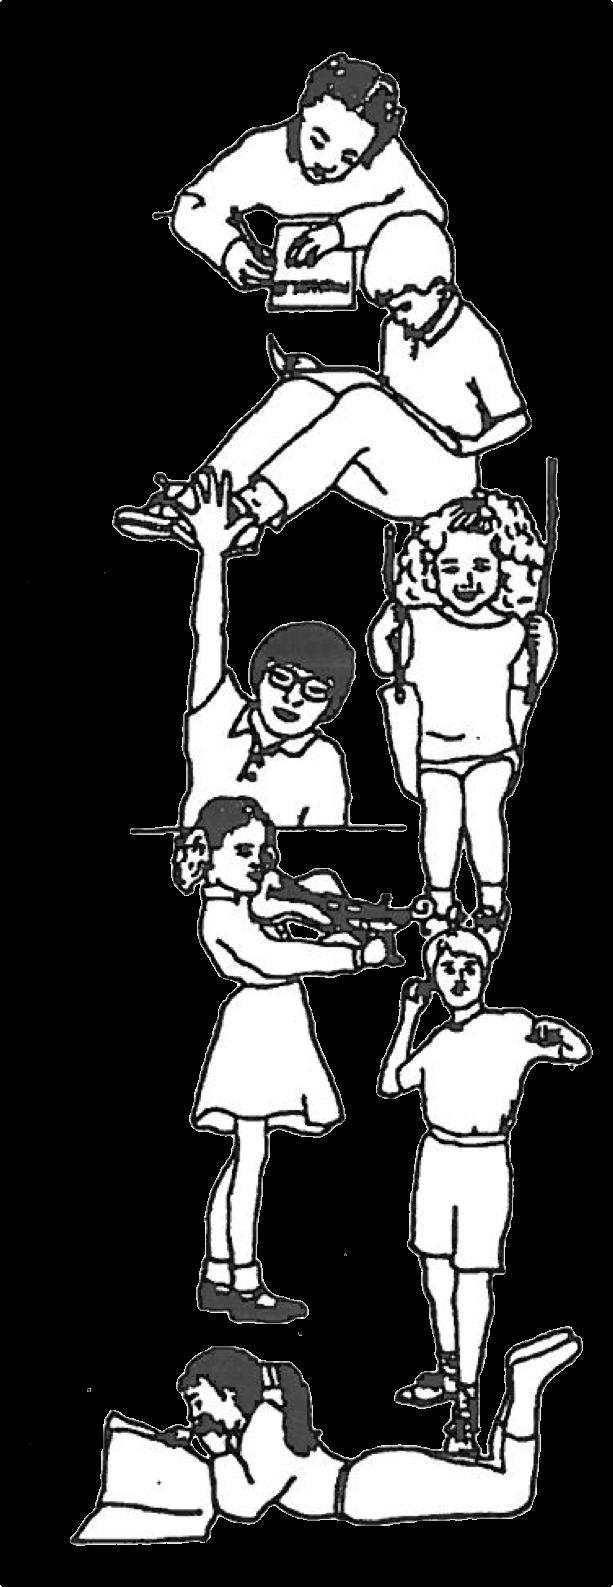 Childhood Activities Illustration